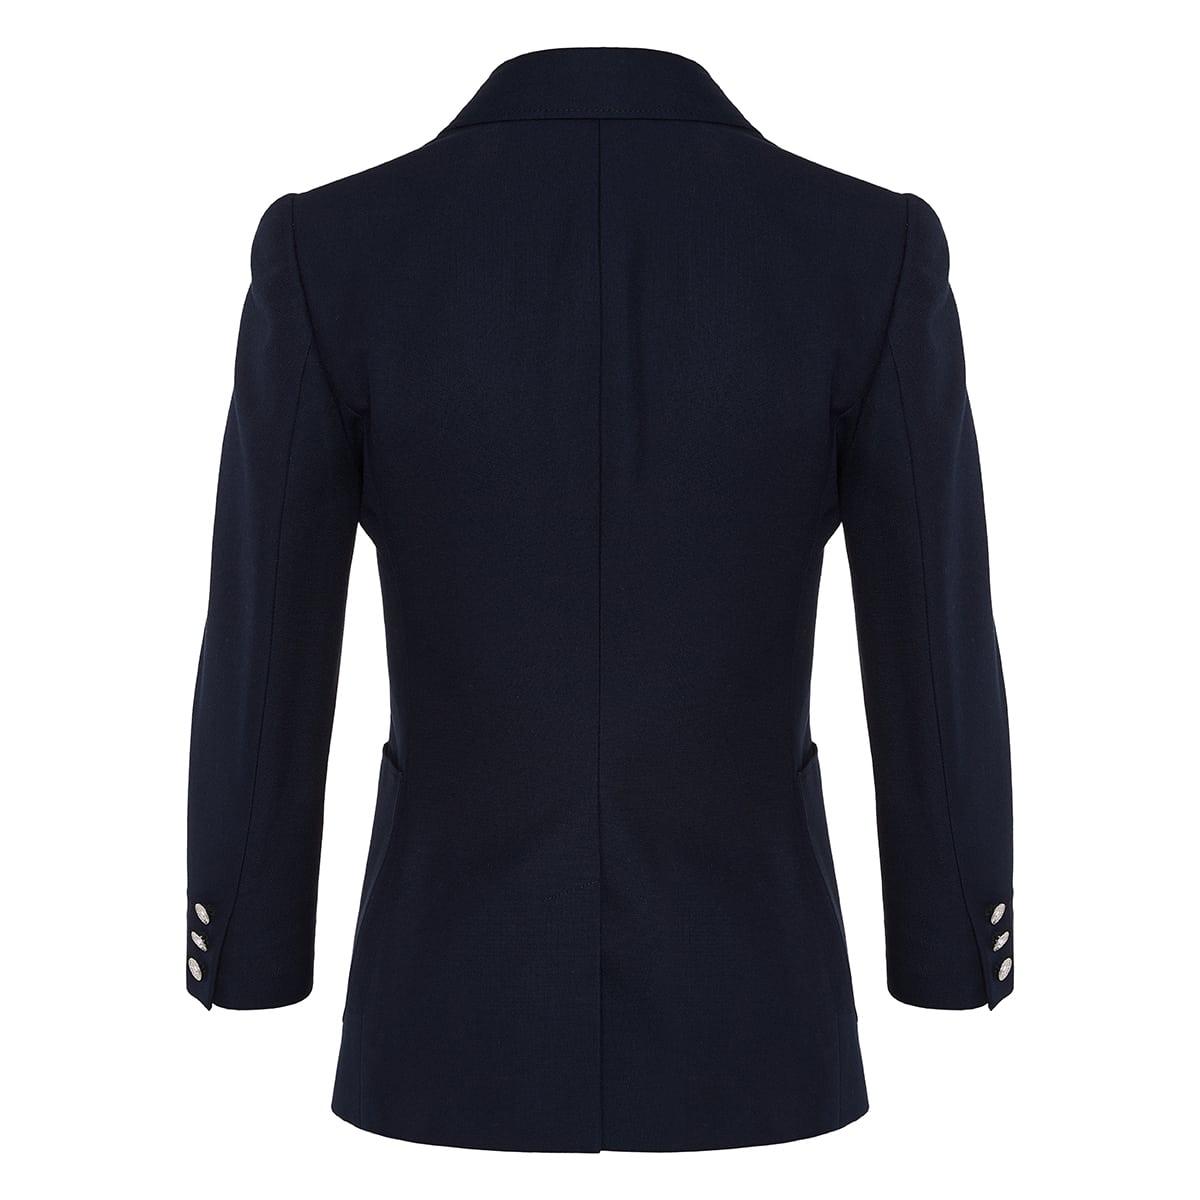 Bead-embellished cotton blazer